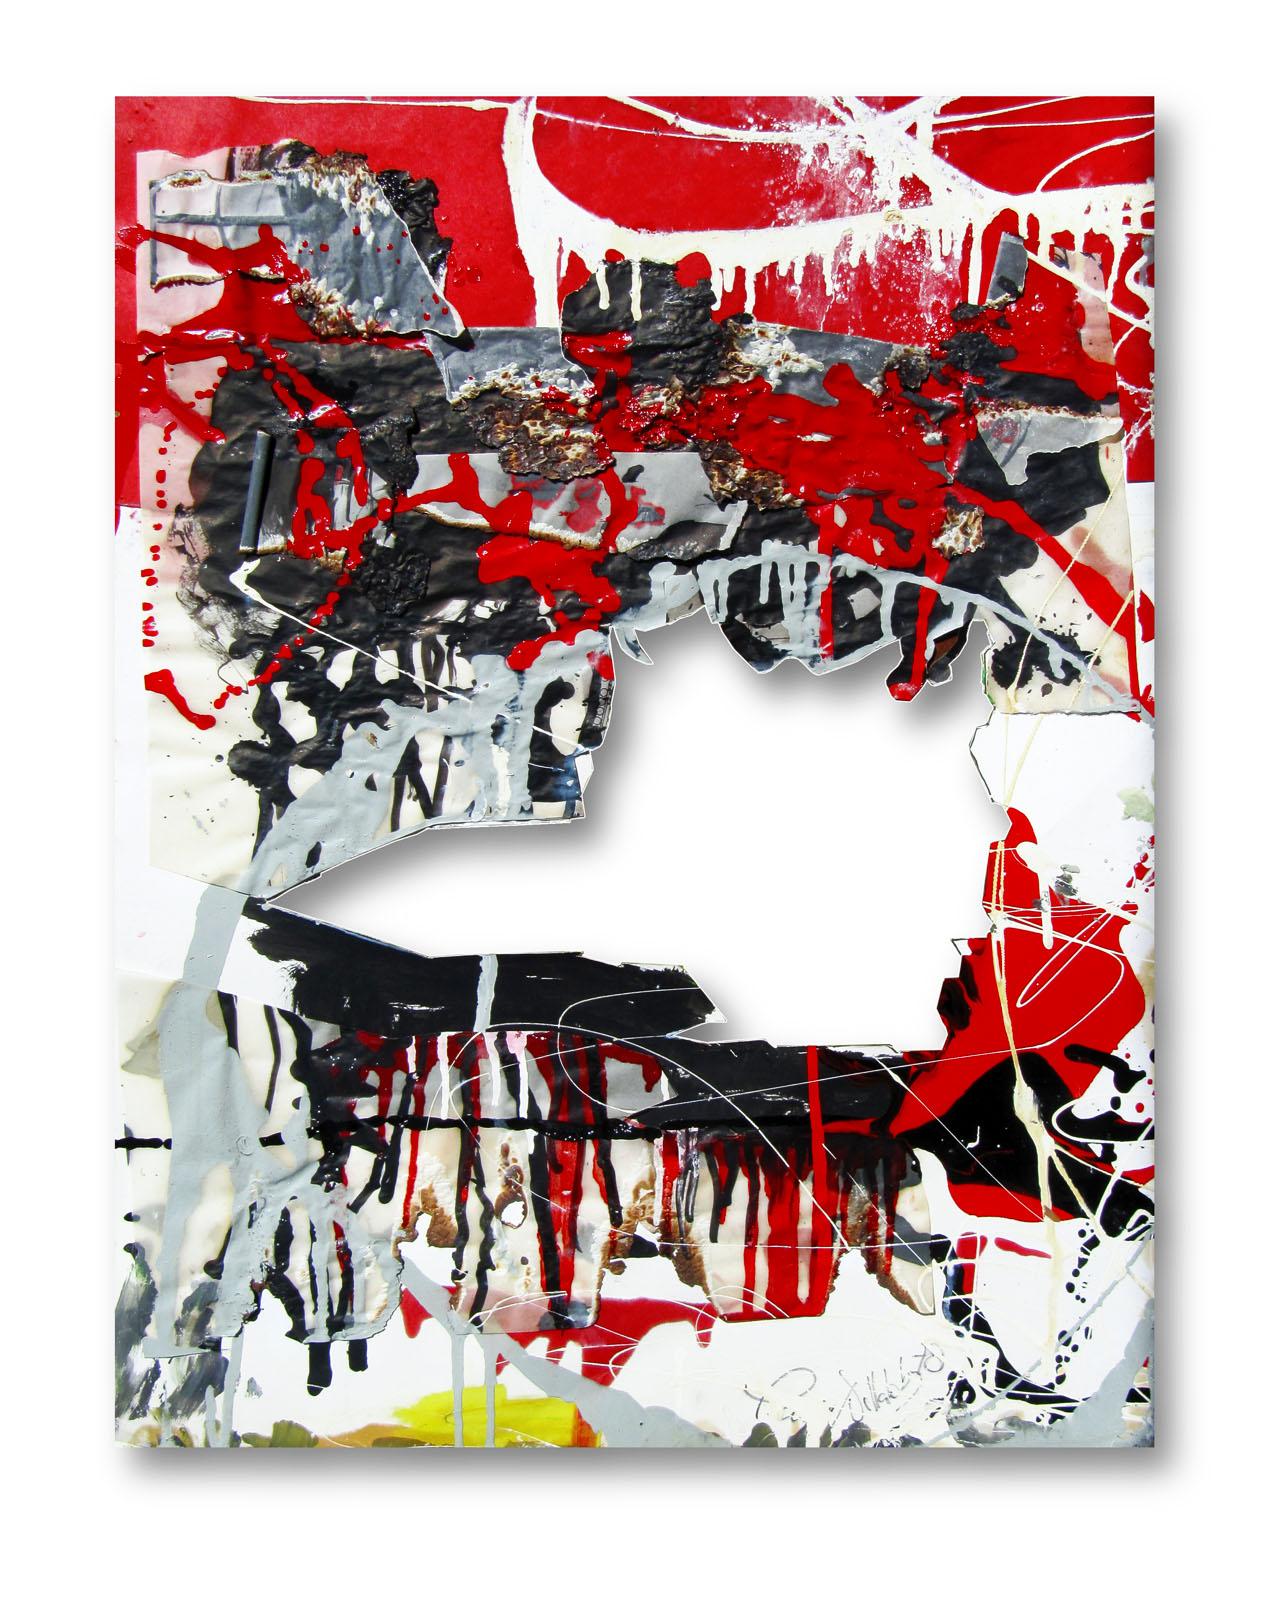 panies-danielvillalobos-spanish-painting-abstractexpressionism-33